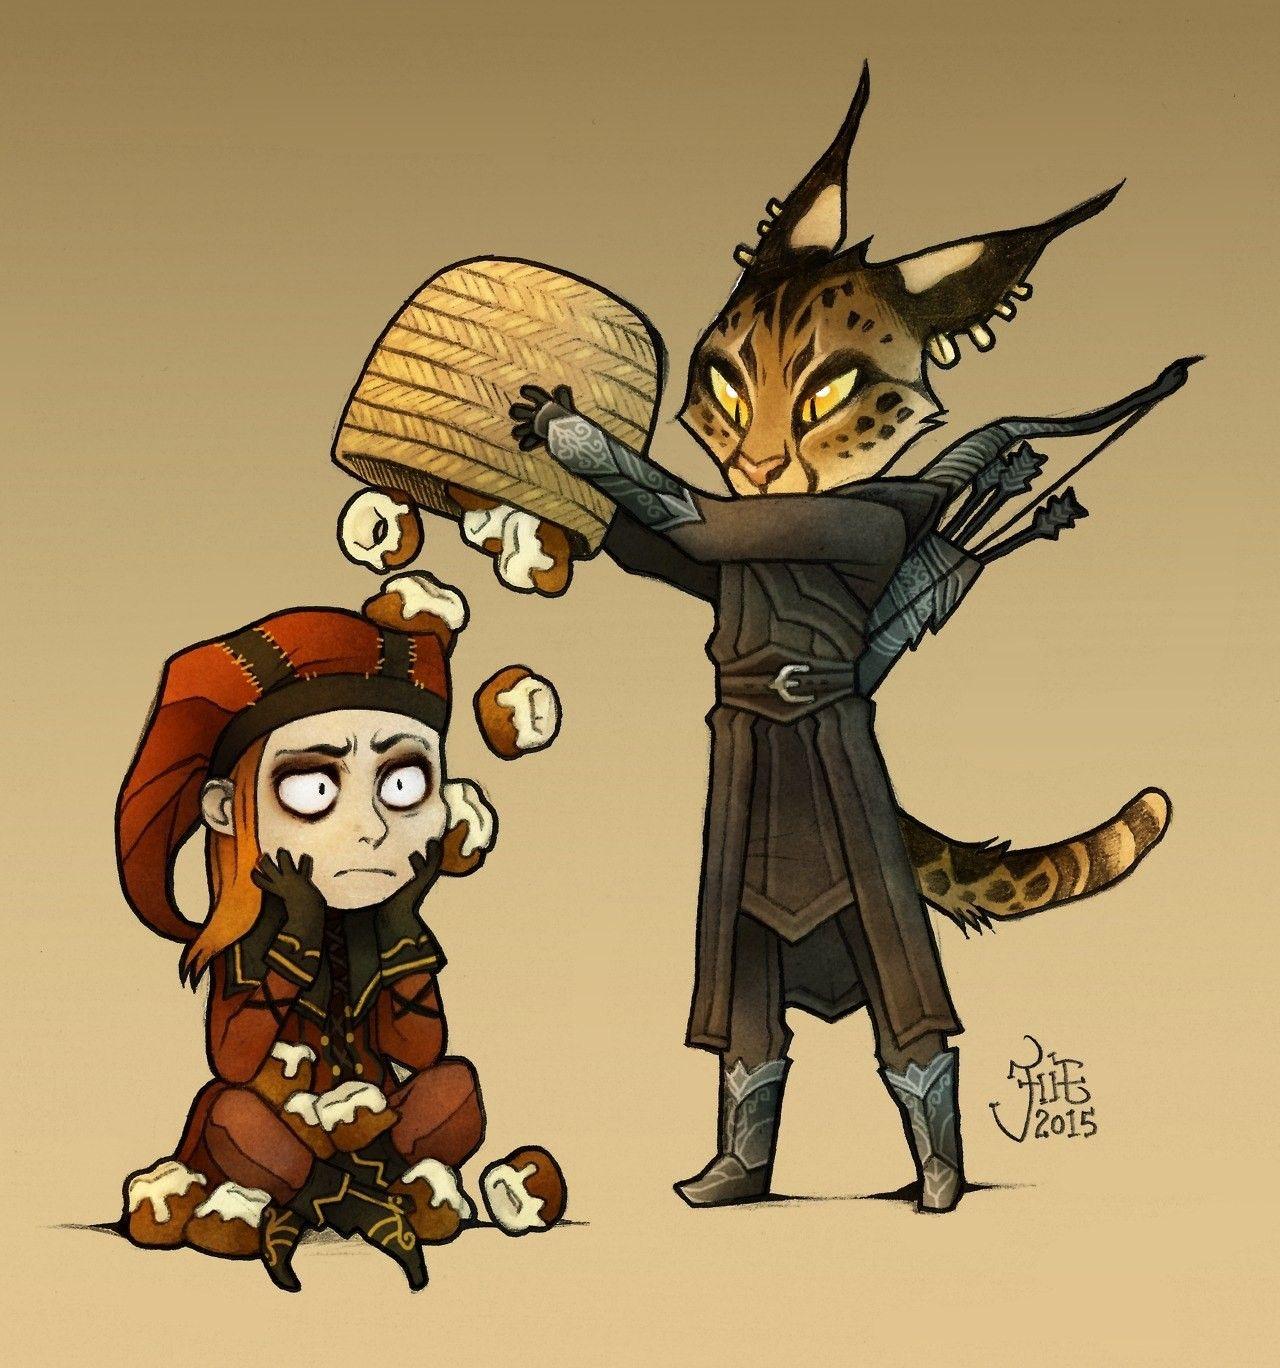 General 1280x1368 The Elder Scrolls V: Skyrim | GEEK!!! | Pinterest ...